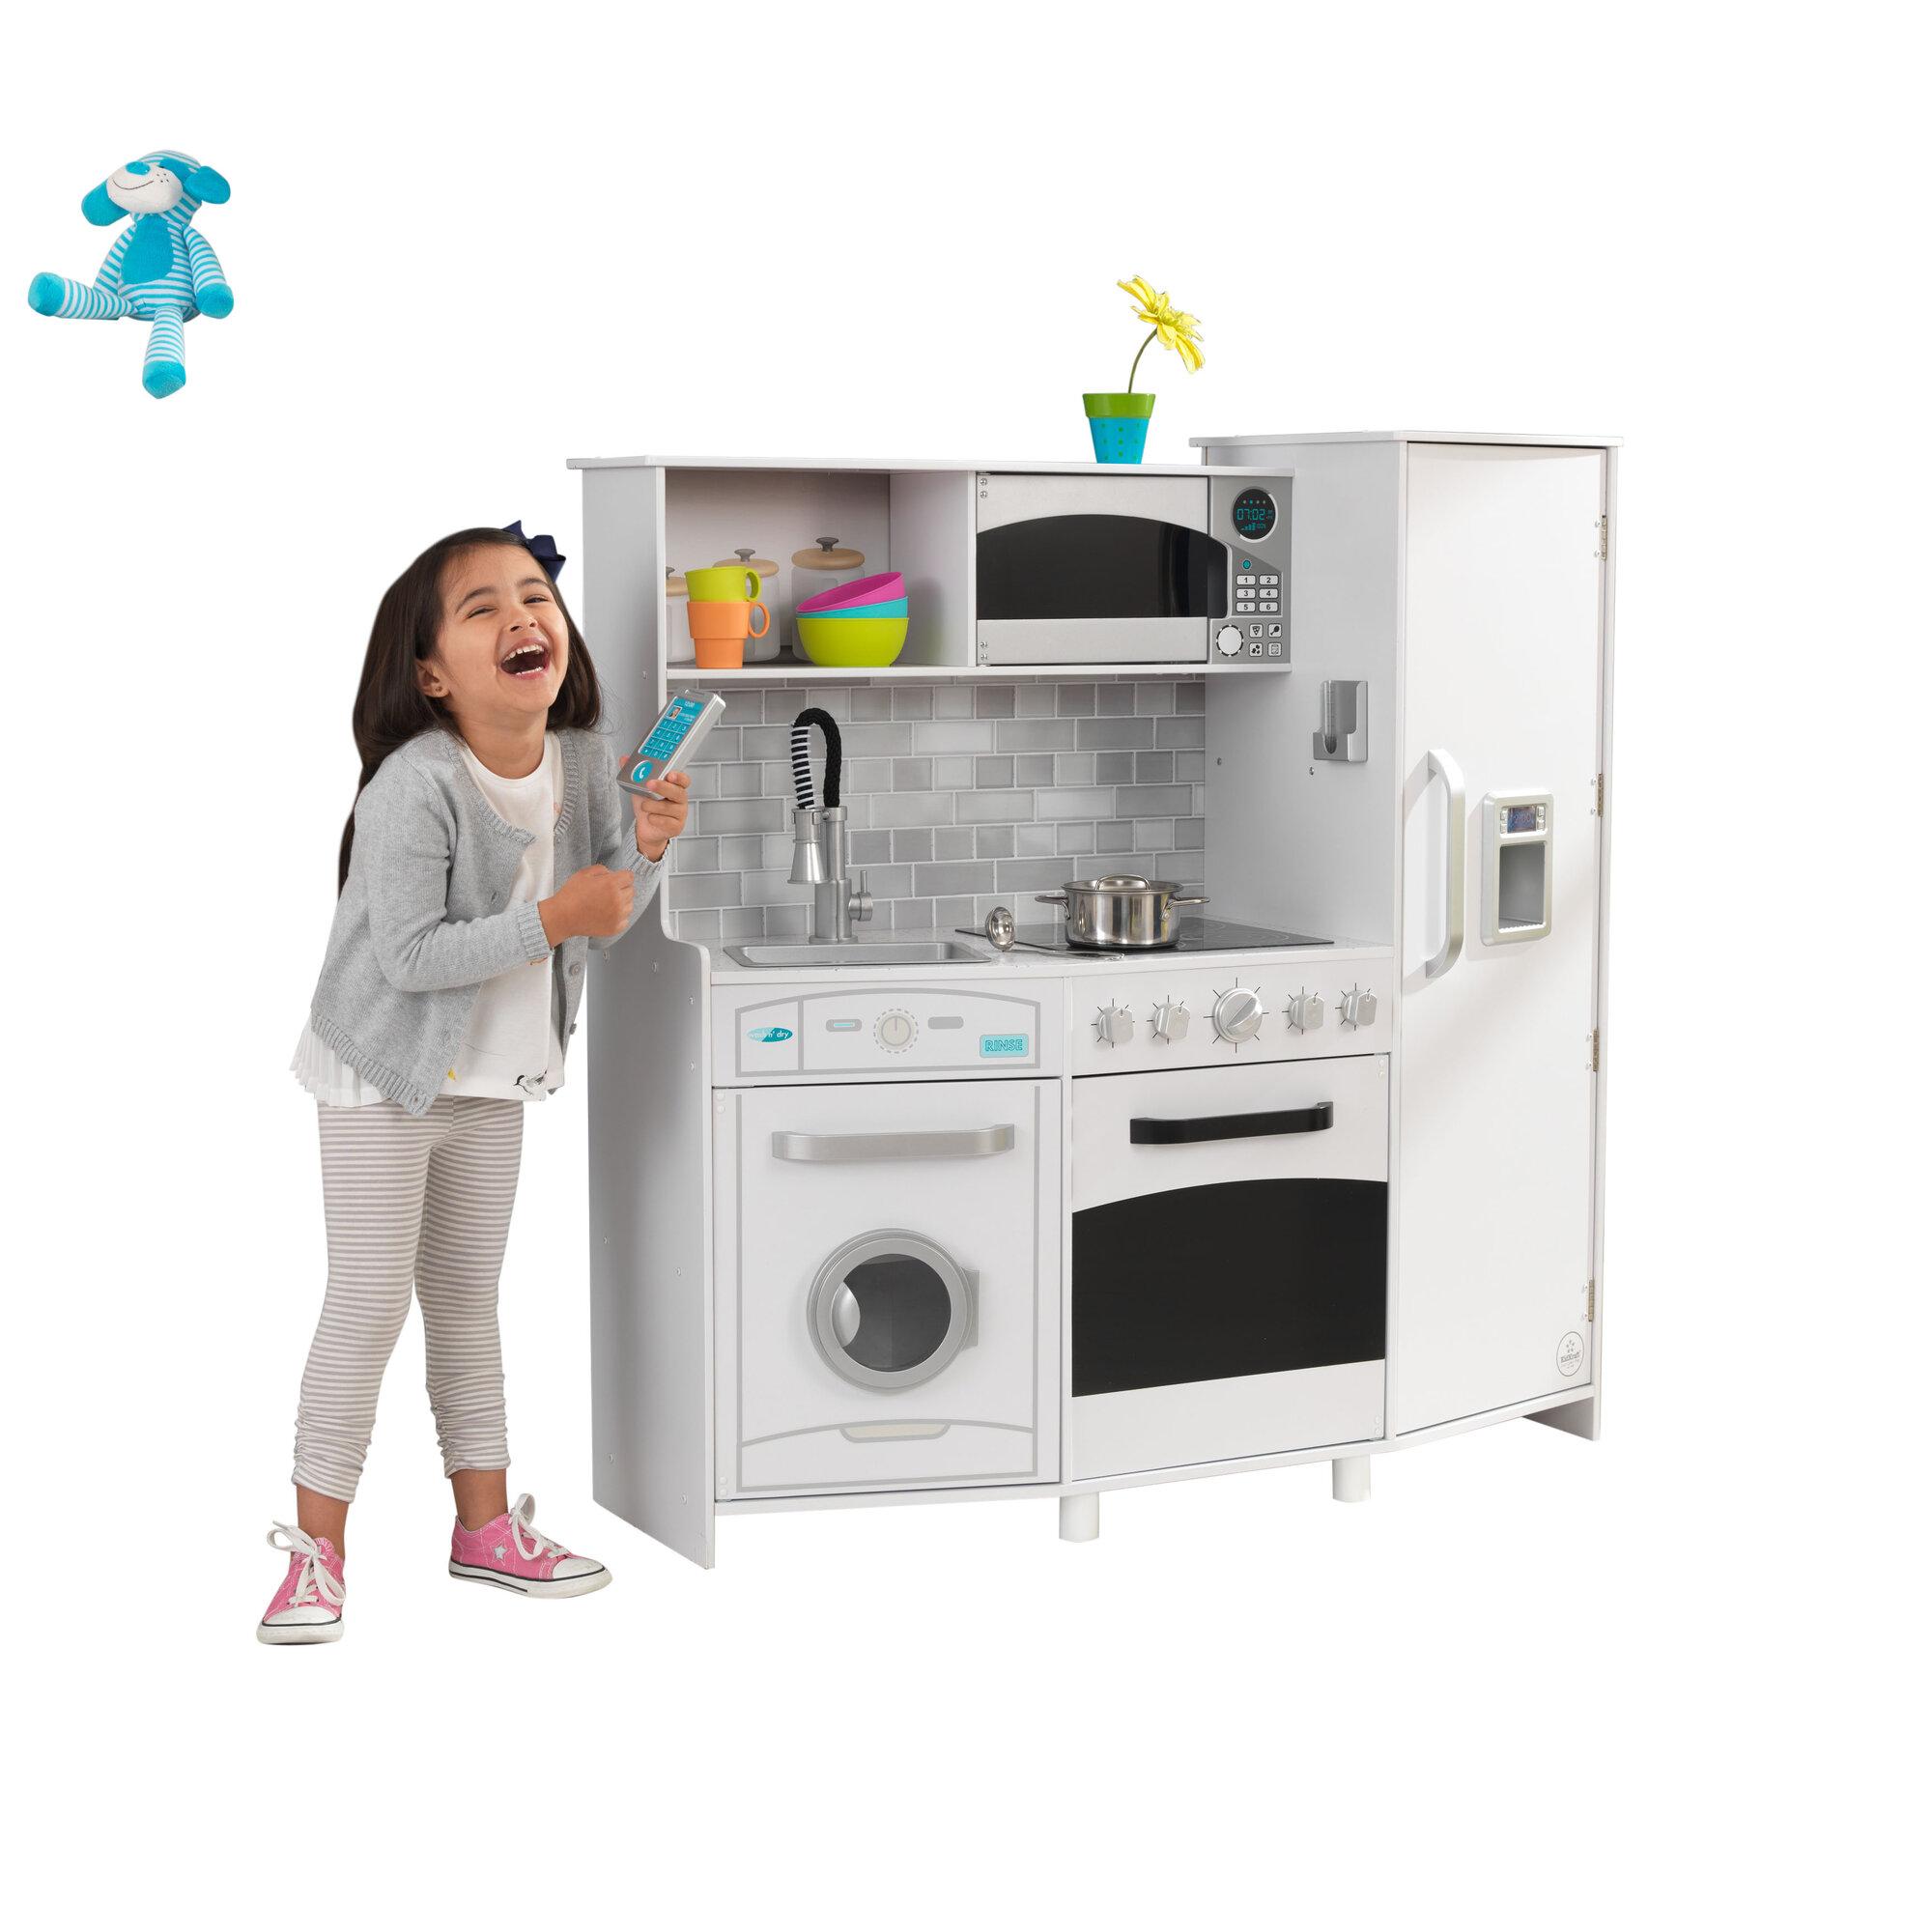 Details about KidKraft Large Play Kitchen Set White